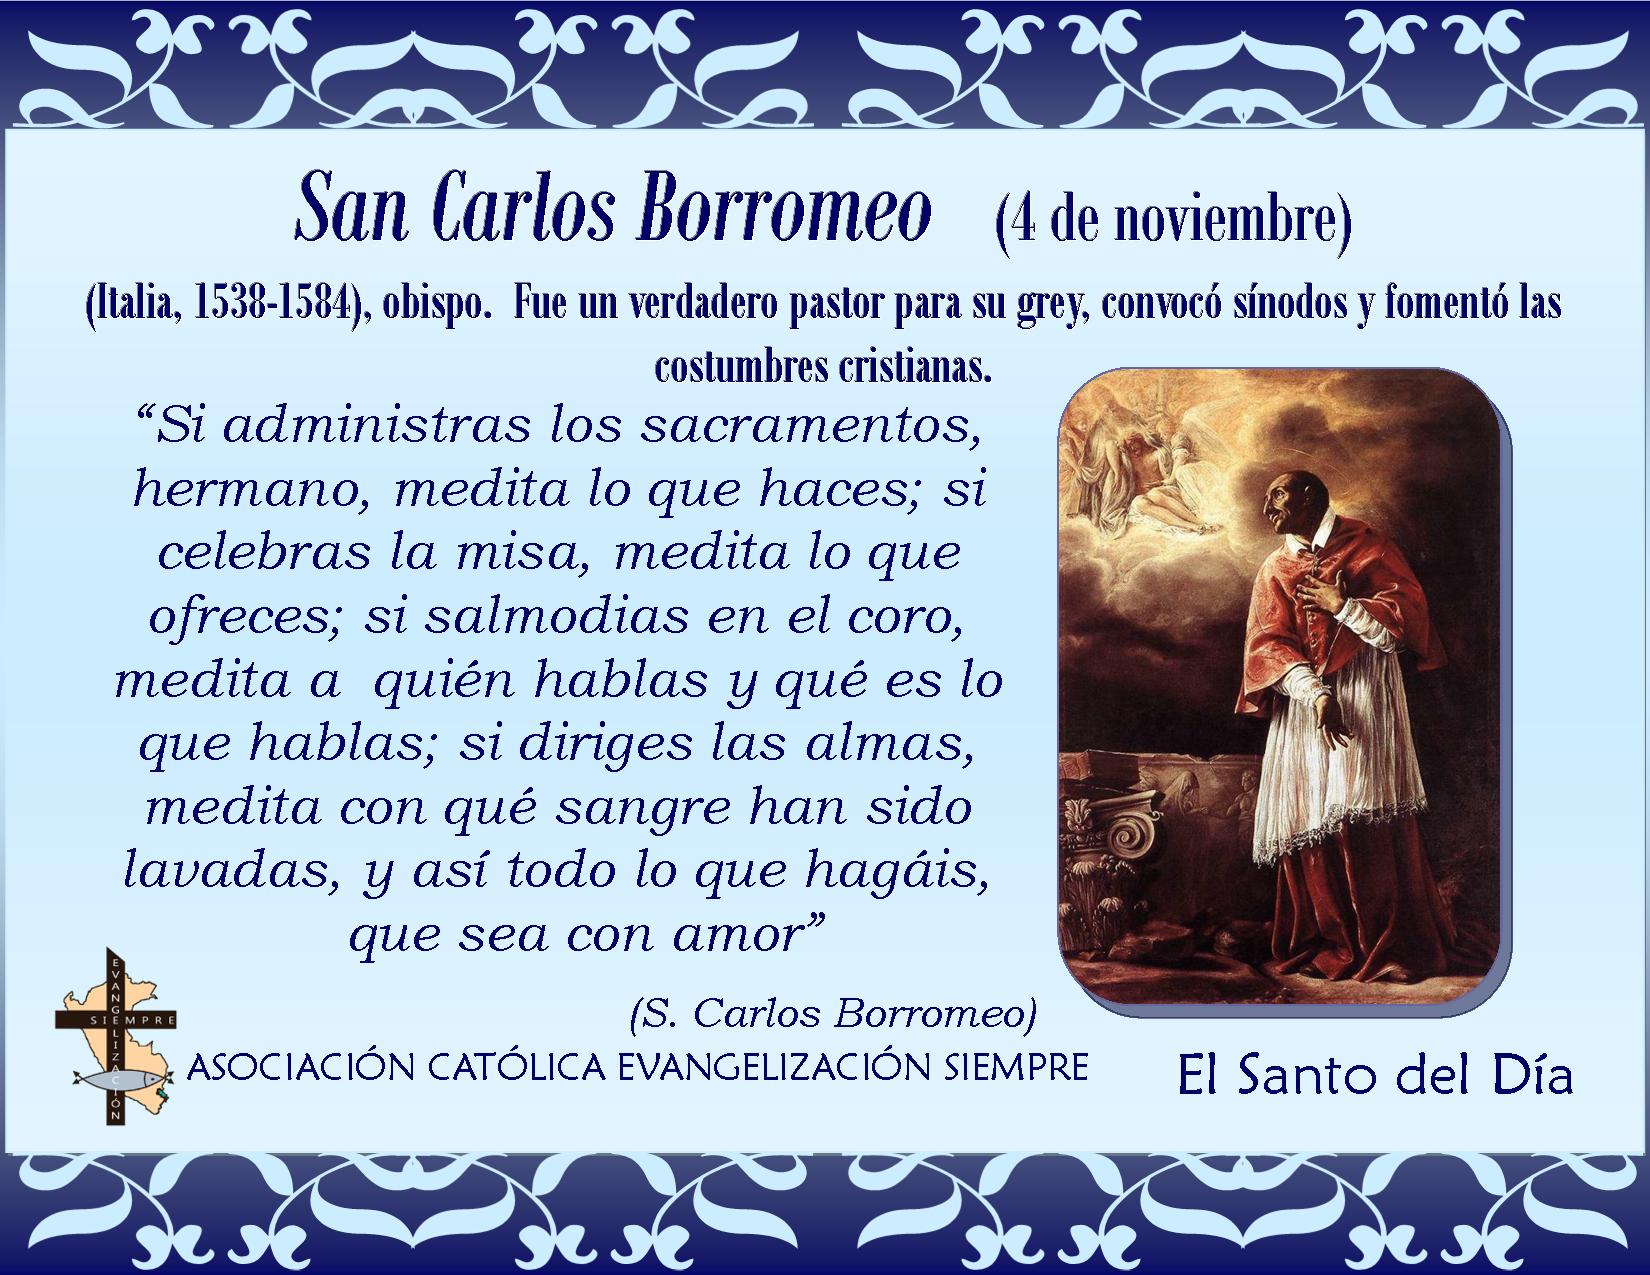 santo-del-dia-4-noviembre